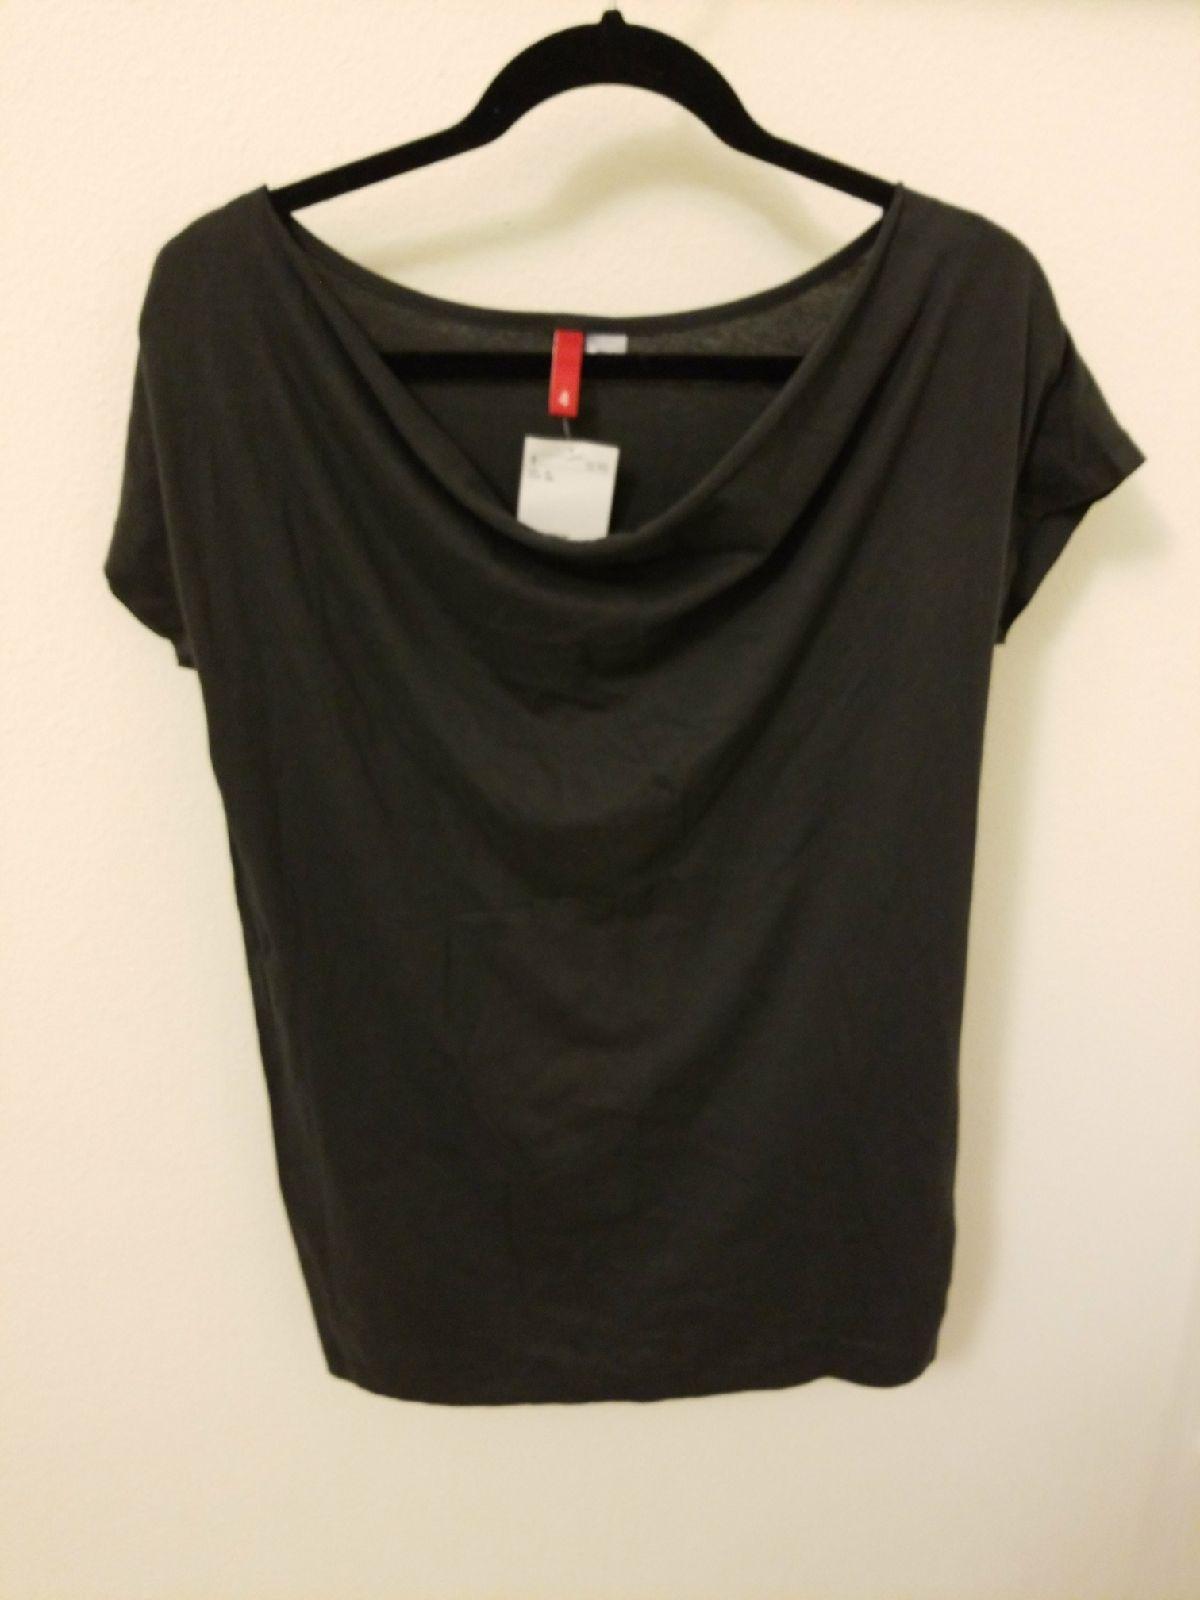 H&M Divided darkest grey black t shirt drape front 4 / Small